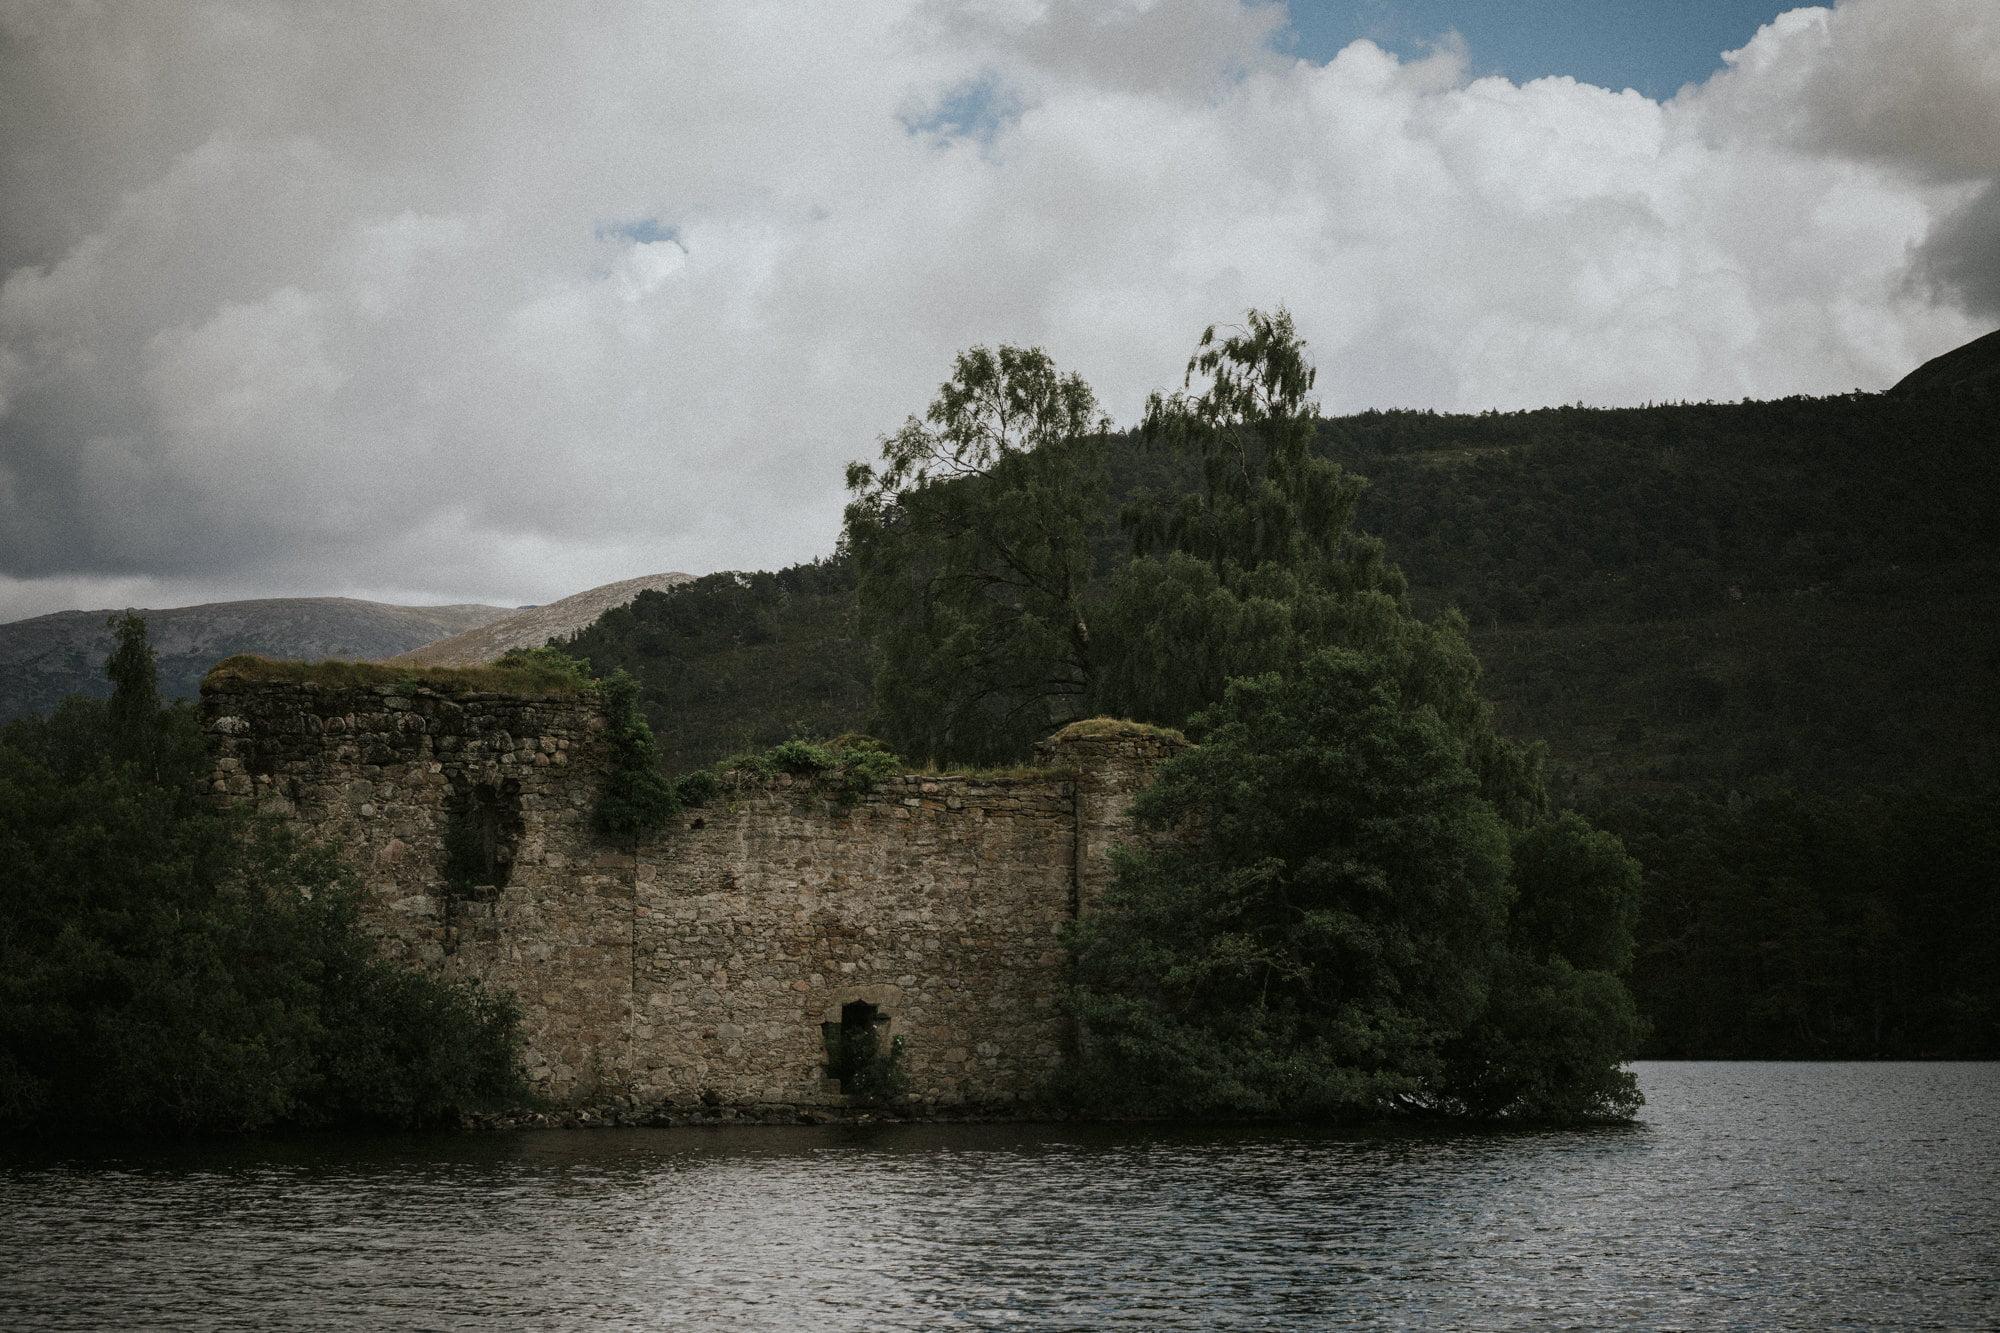 Loch an Eilein elopement, Aviemore elopement, Cairngorms elopement in the Scottish Highlands Lochs